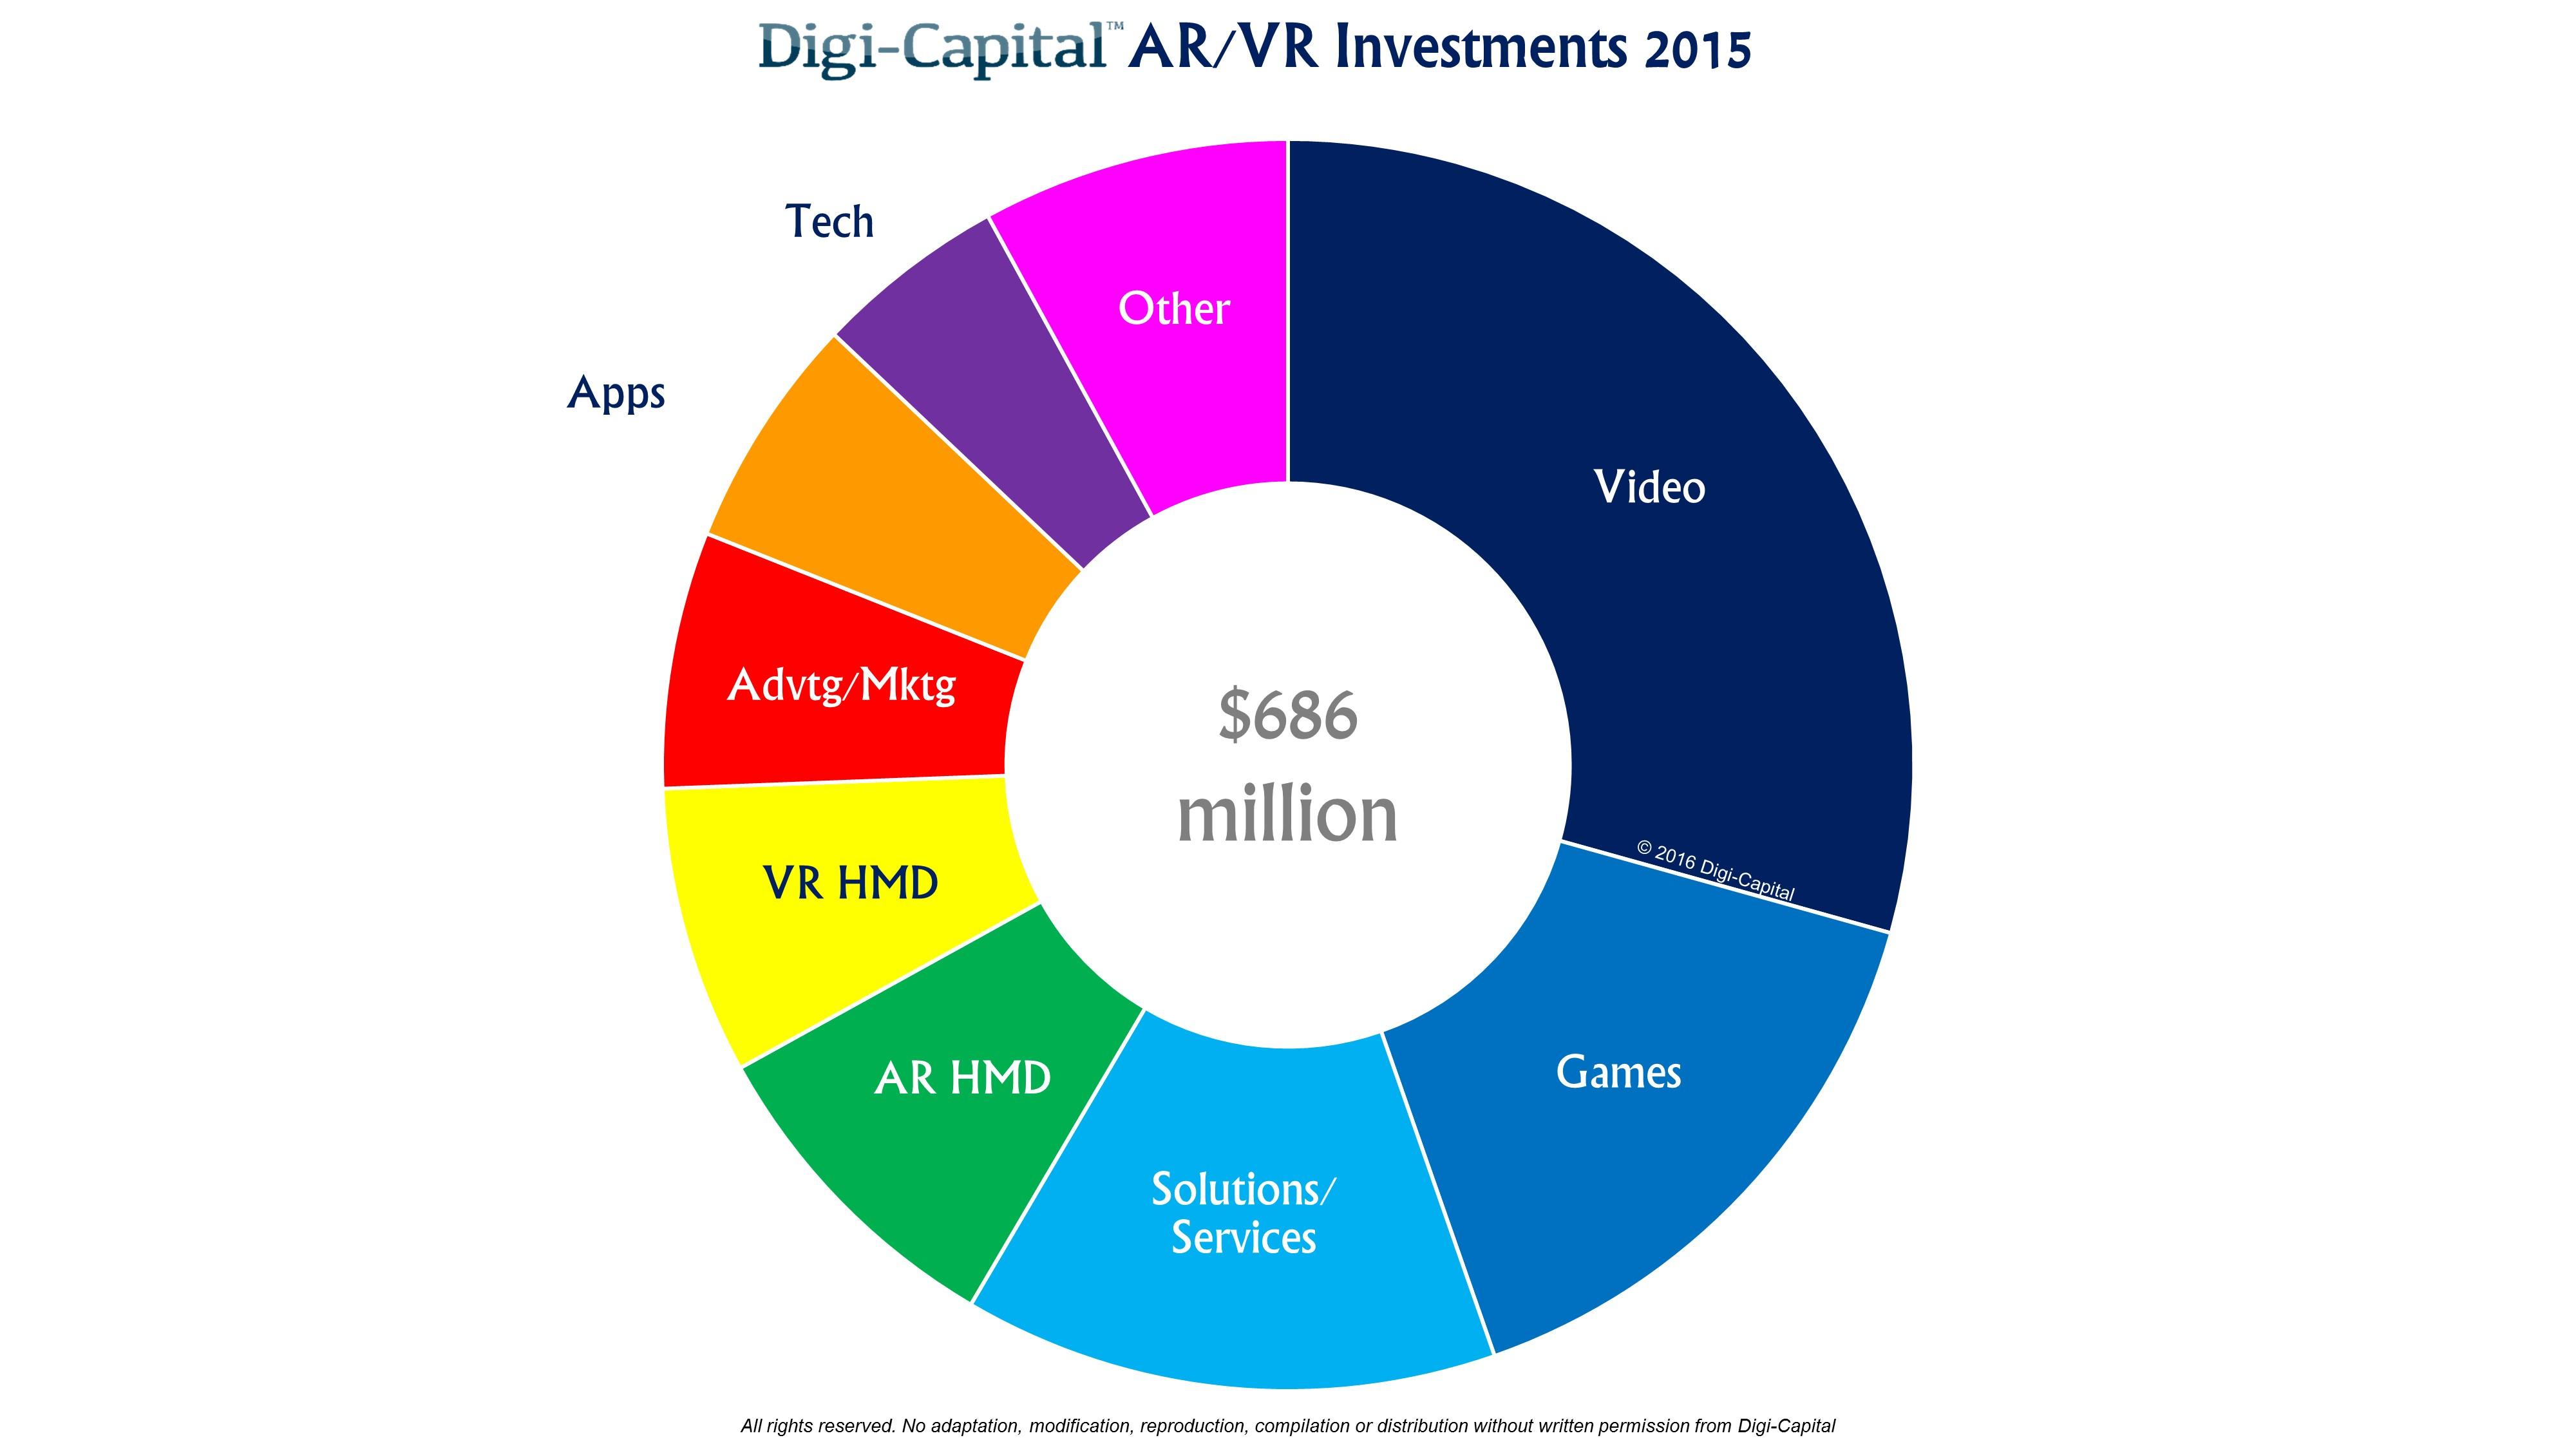 Digi-Capital-ARVR-Sector-Investments